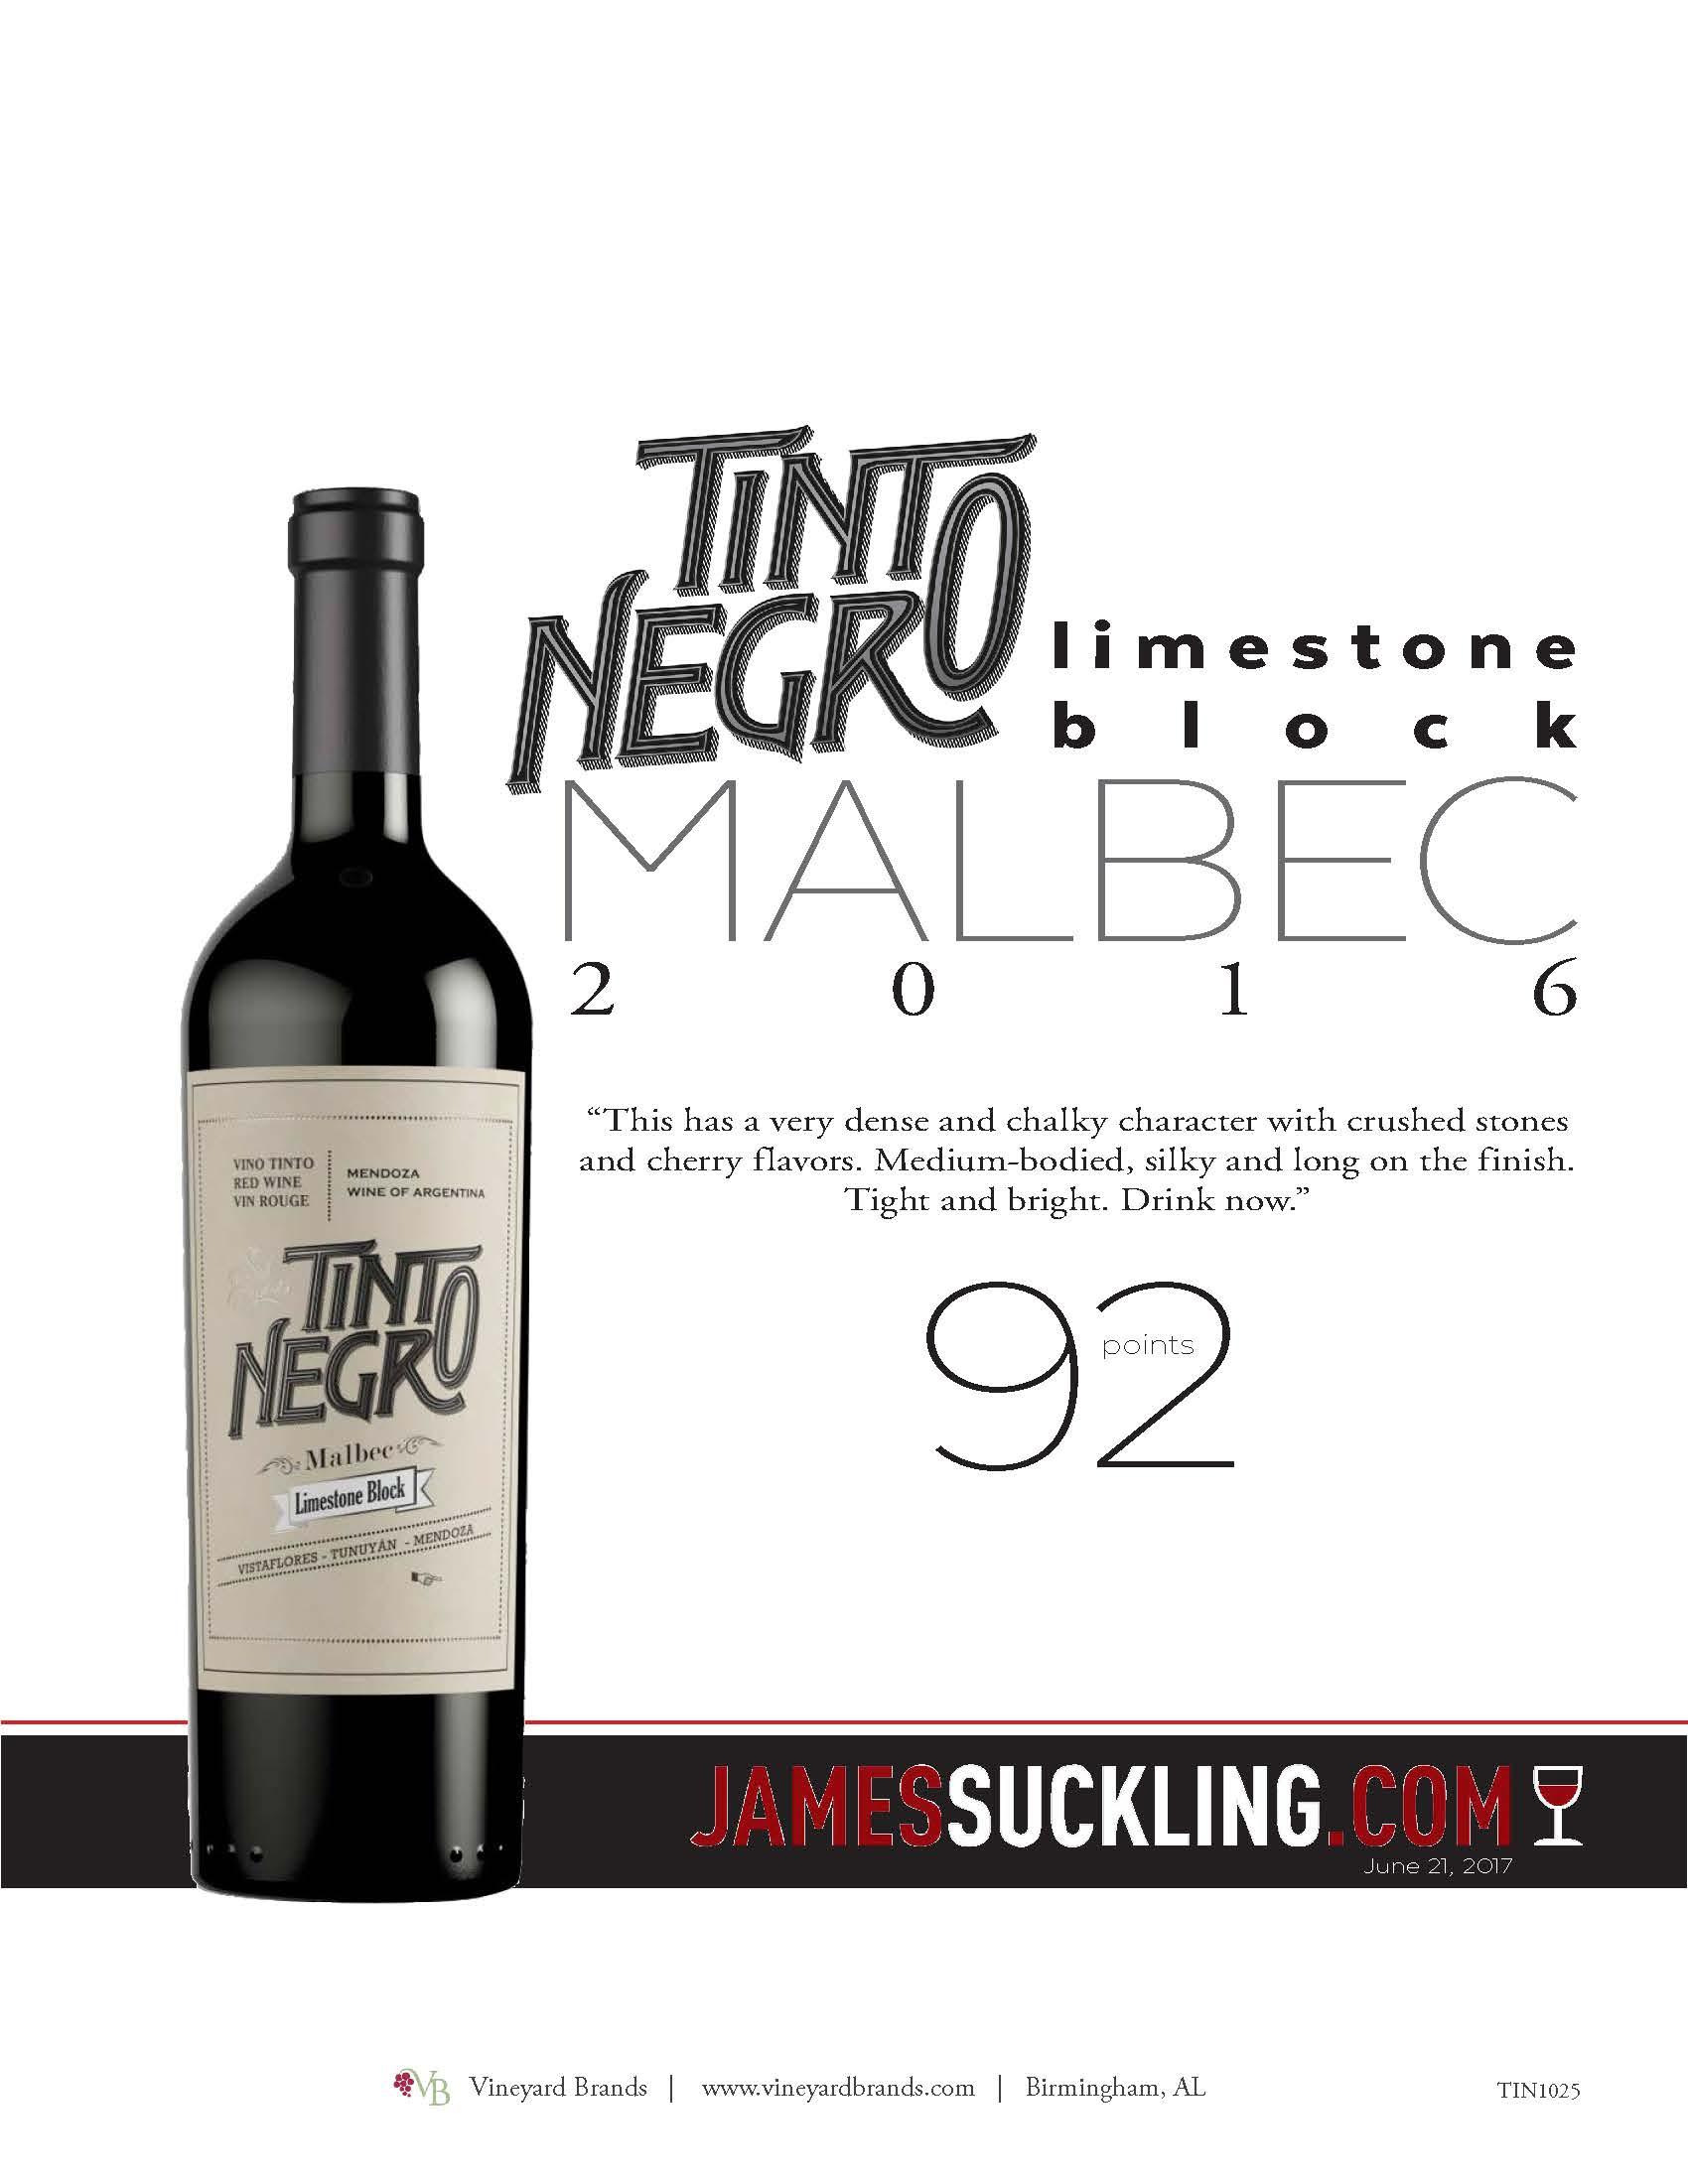 Tinto Negro Limestone Block Malbec 2016.jpg